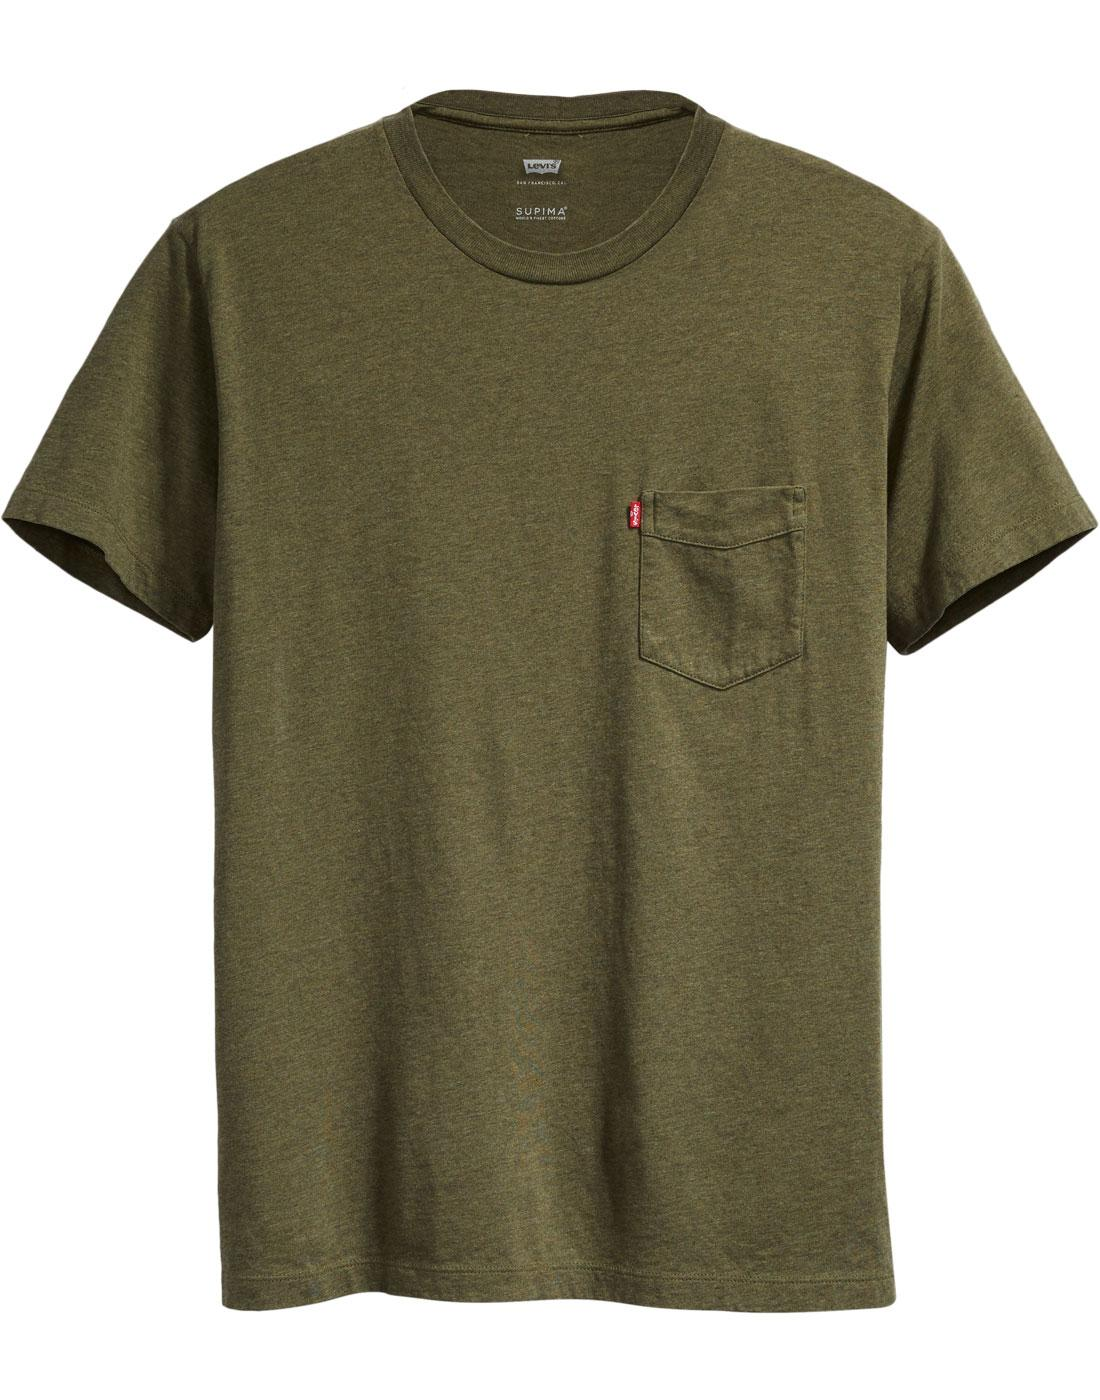 LEVI'S Sunset Pocket Retro 70s T-shirt (SEA MOSS)